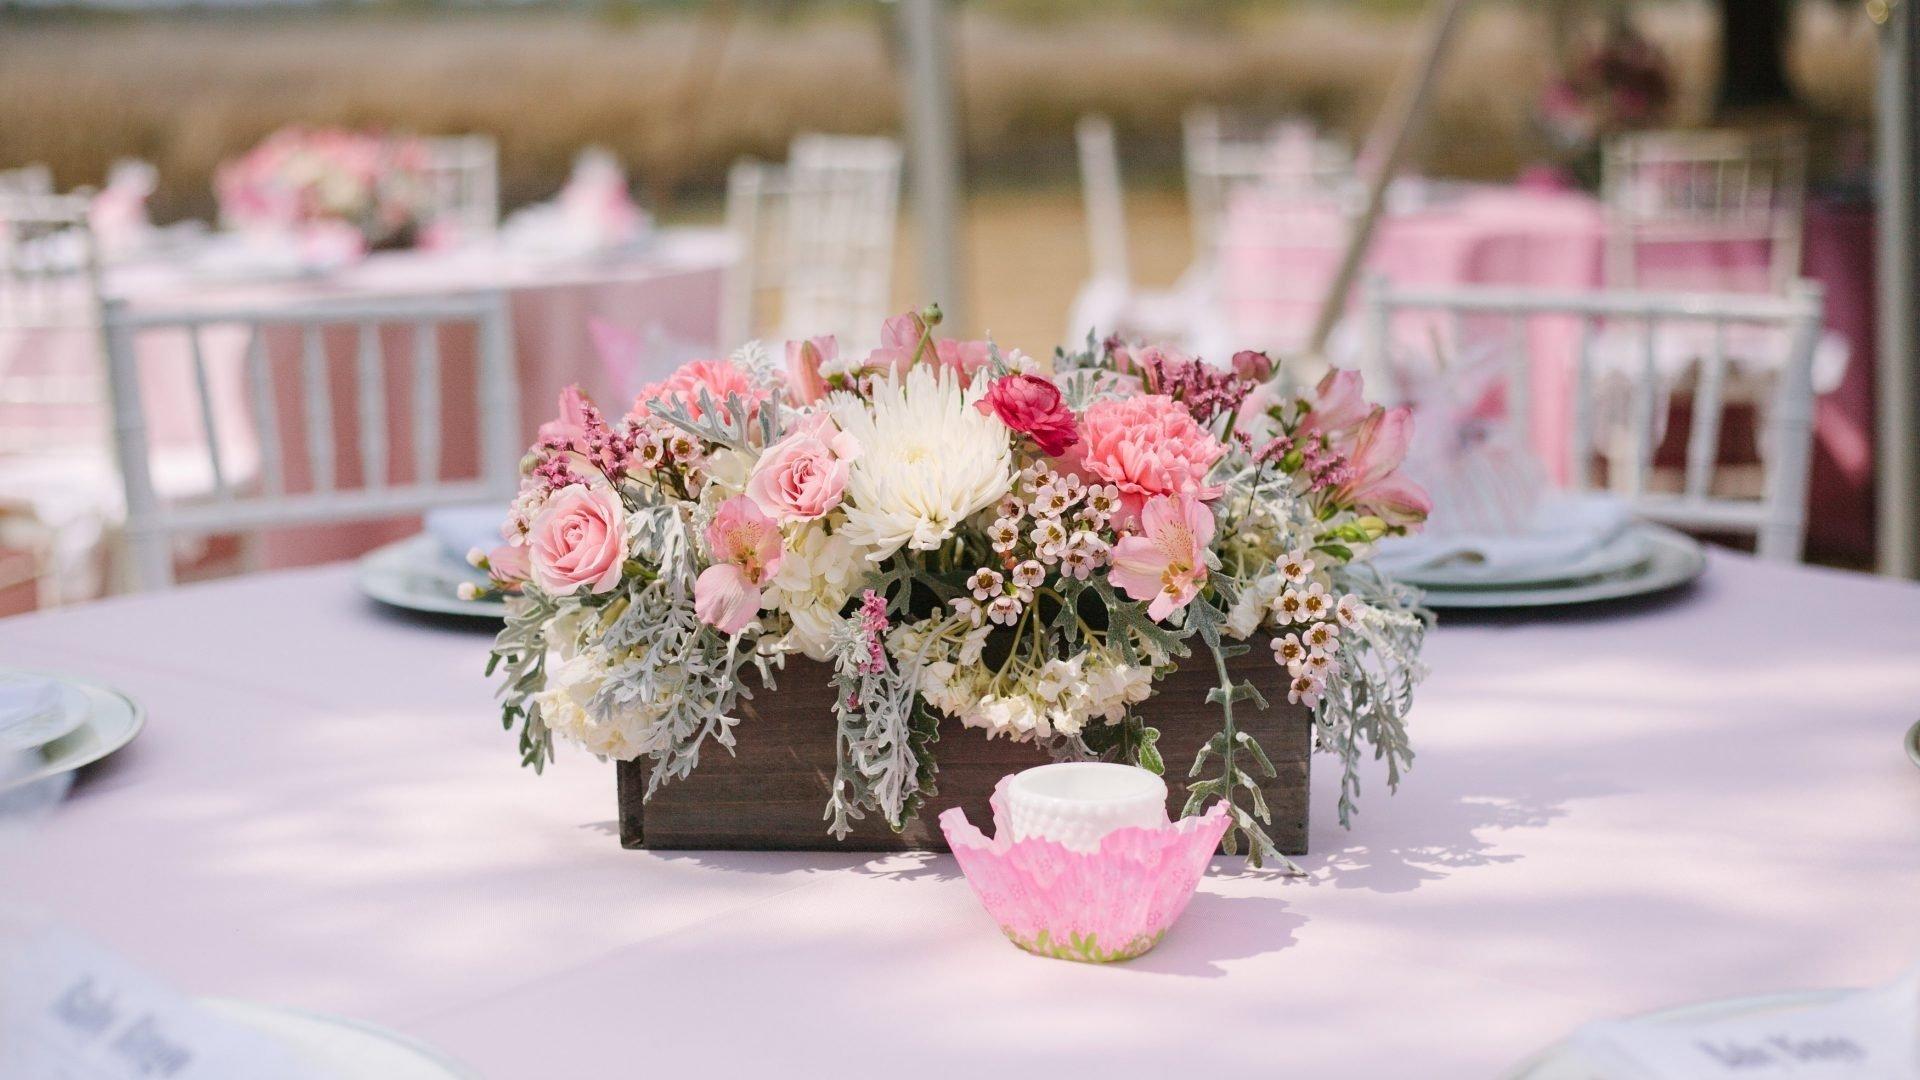 10 Fabulous Baby Shower Flower Centerpiece Ideas baby shower girl flowernts centerpieces floral literarywondrous